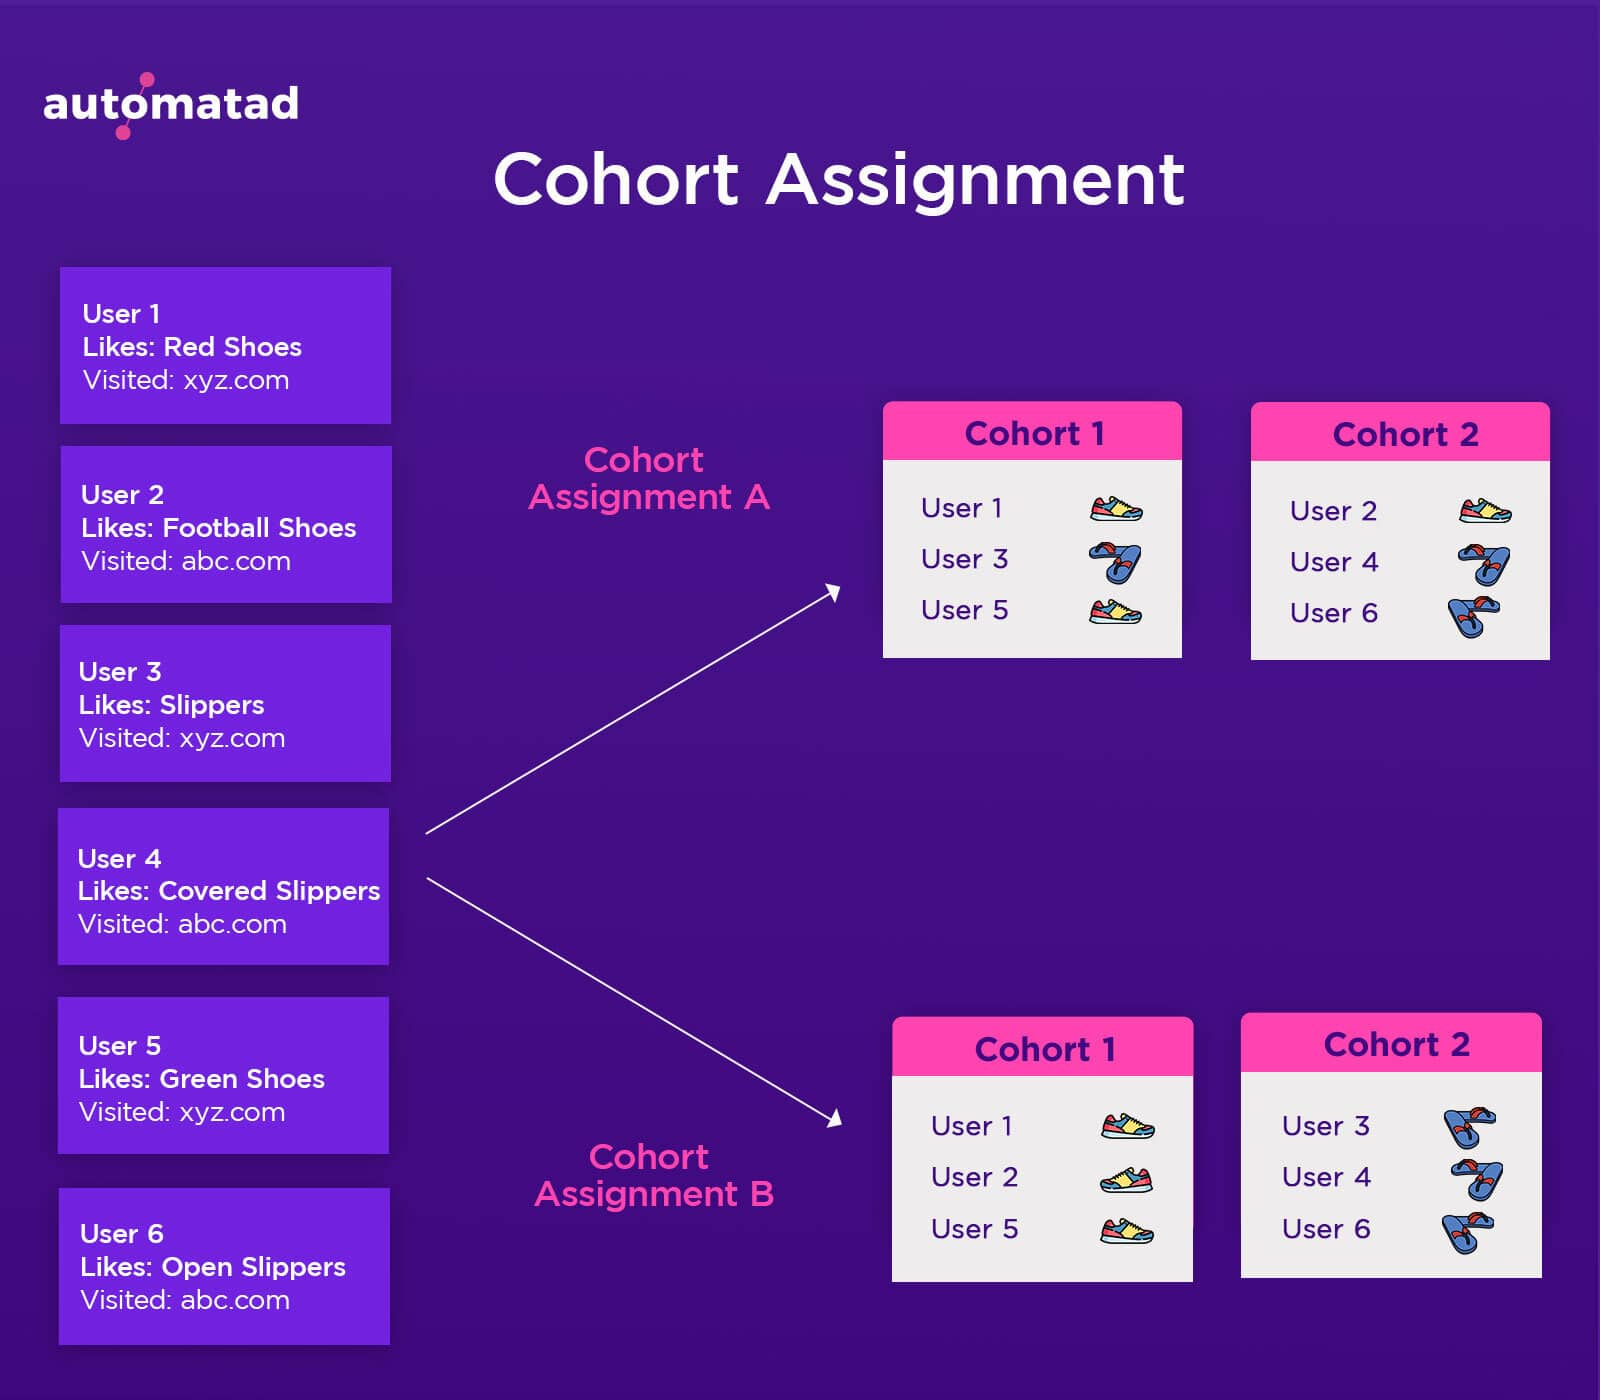 Cohort Assignment